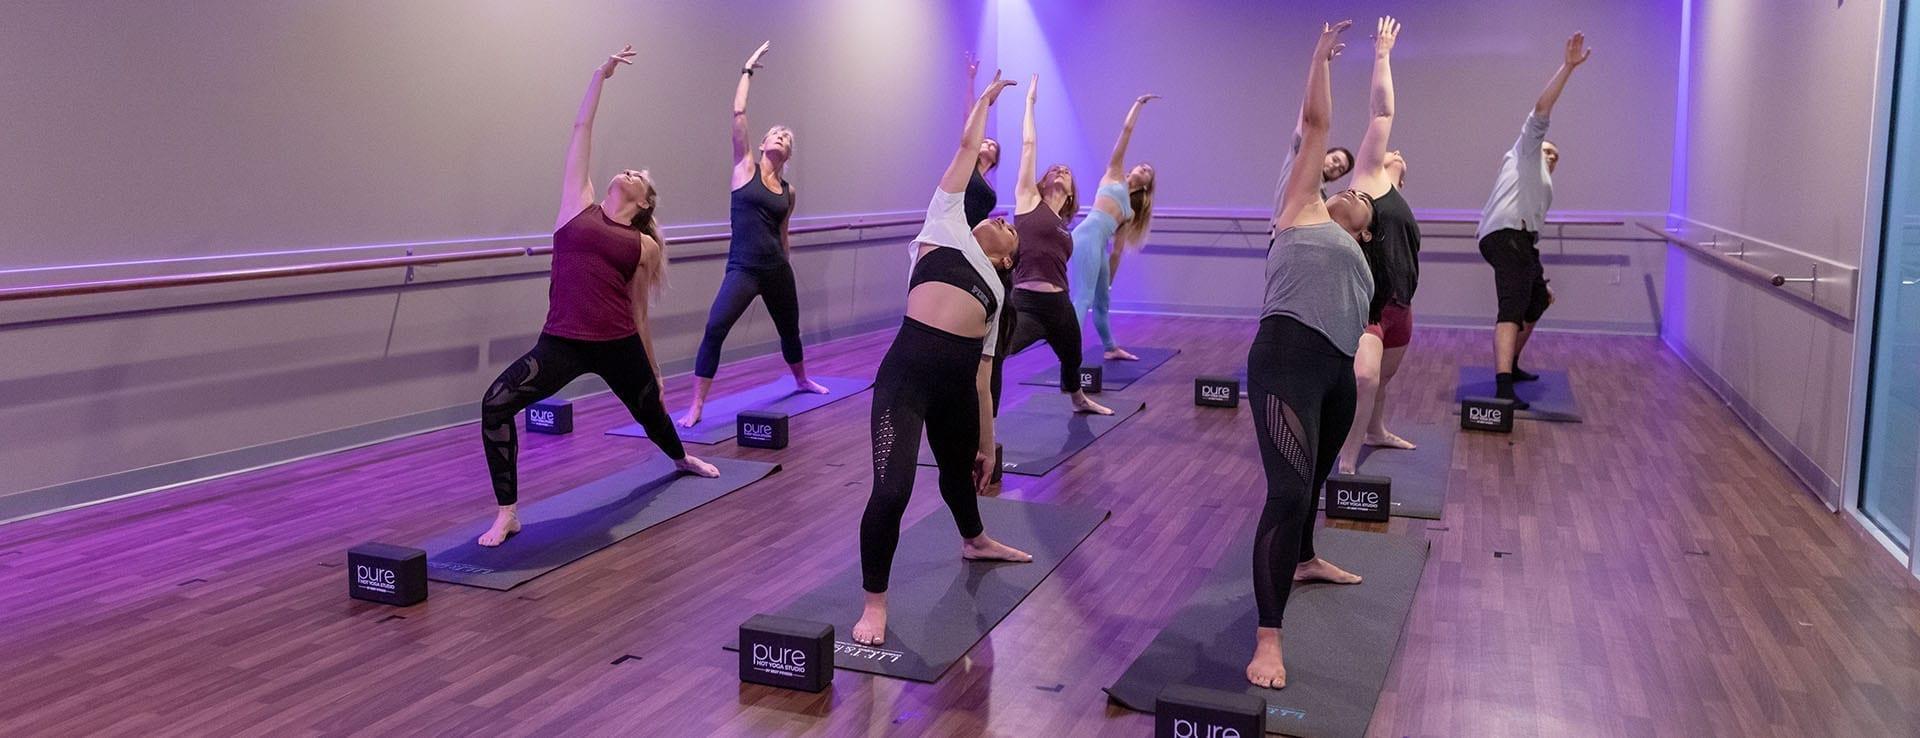 yoga class in best gym studios fitness class